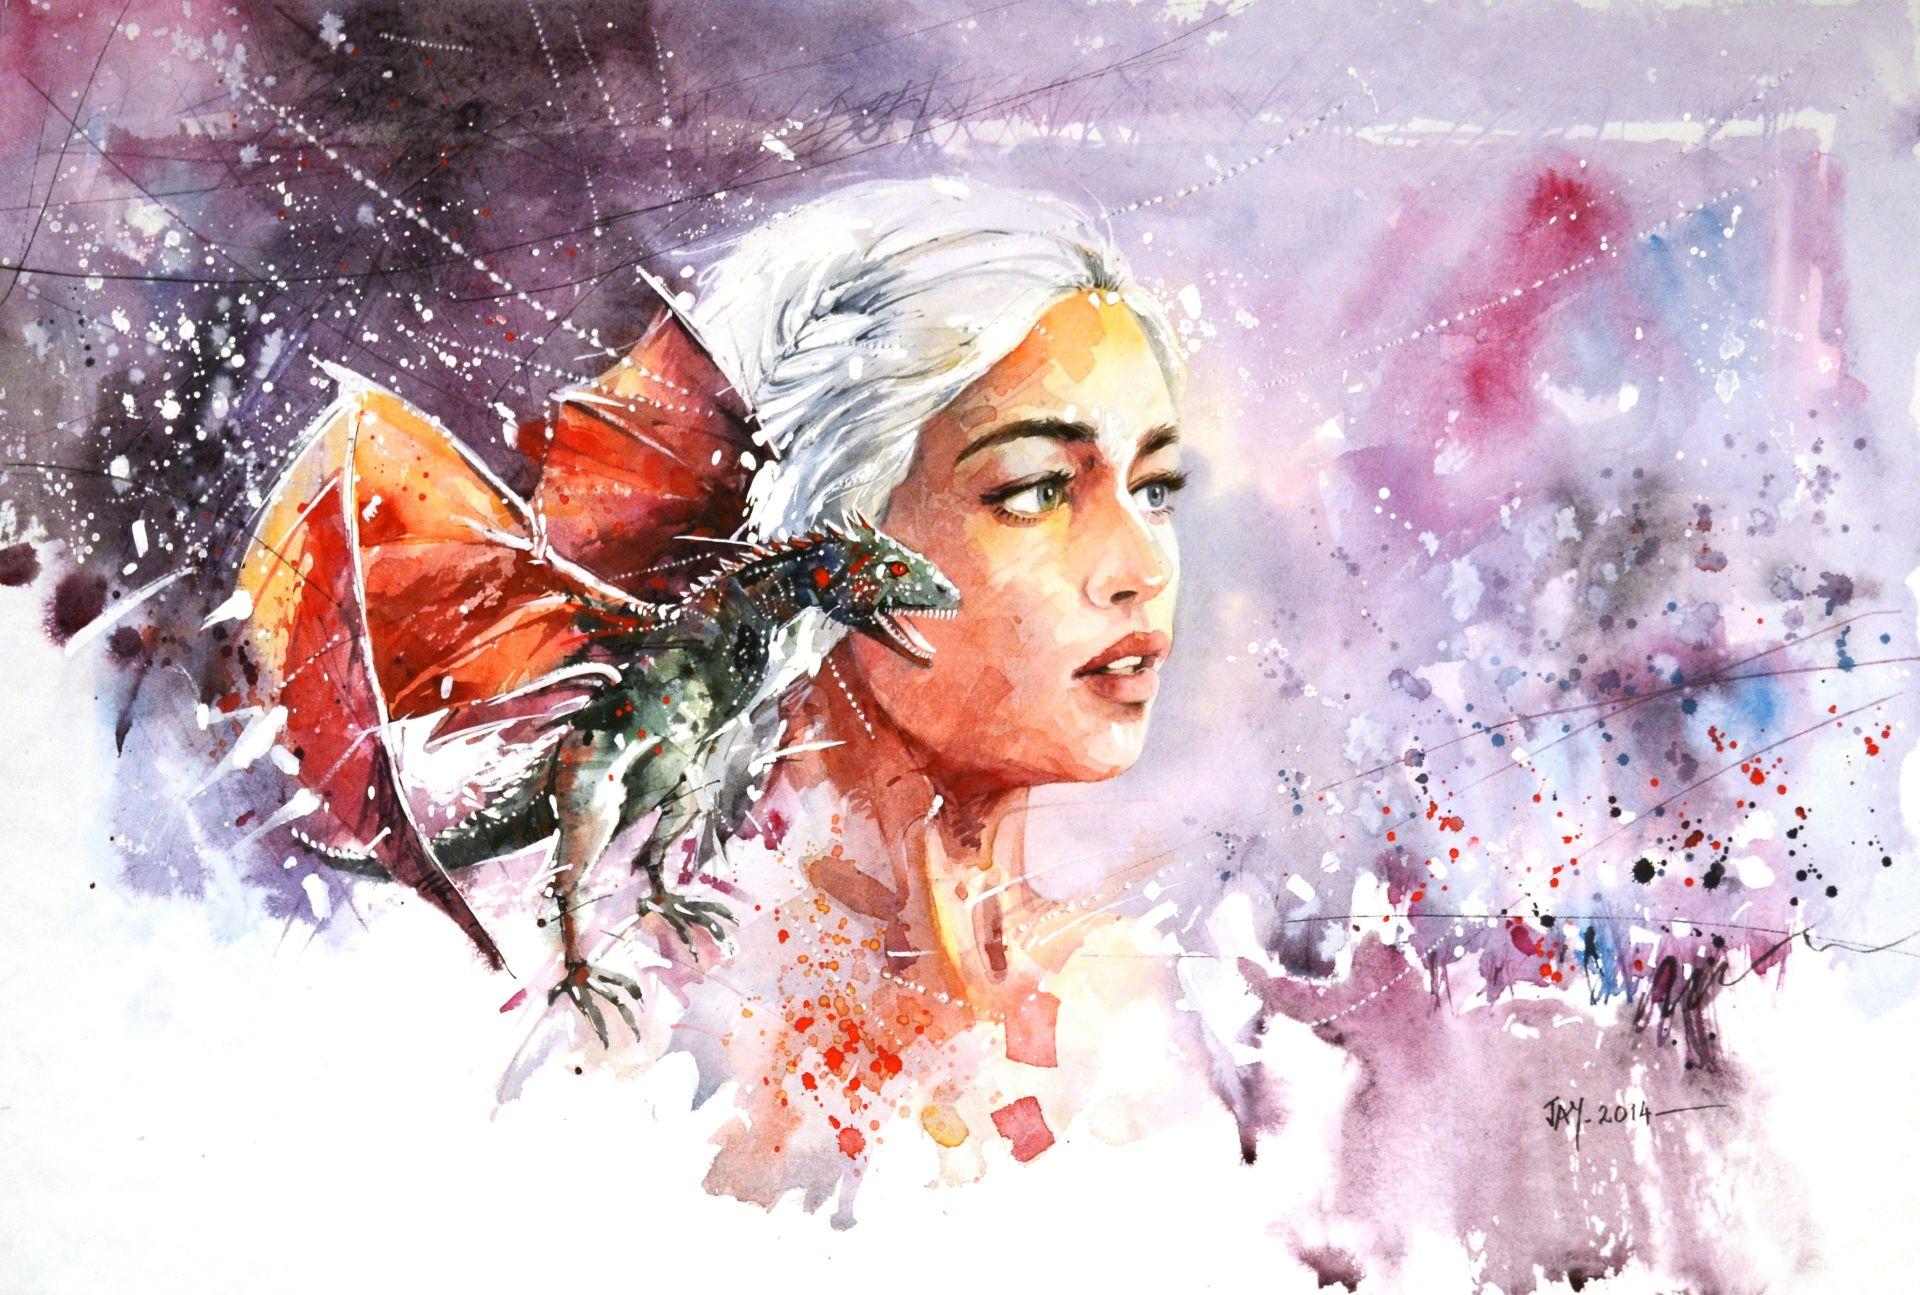 Daenerys Targaryen with dragon cool fan art